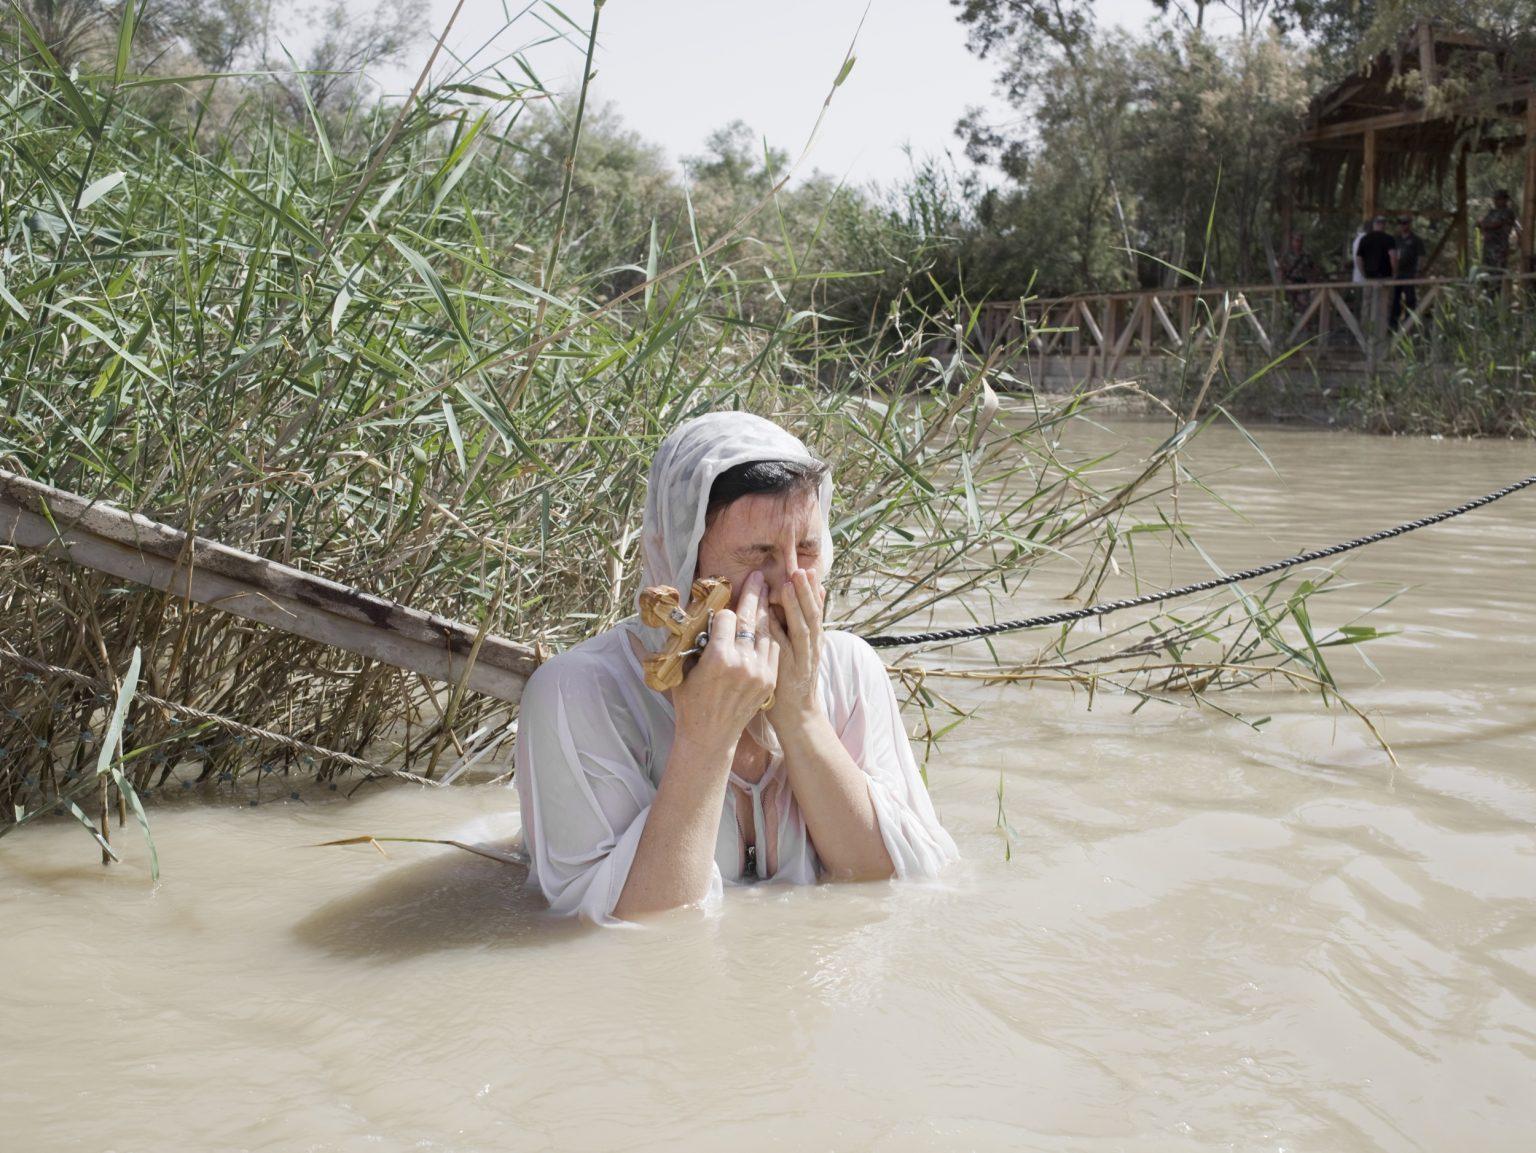 Christians pilgrims in Qasir Al Yahud, the new baptismal site near Jericho in Palestine on the border with Jordan